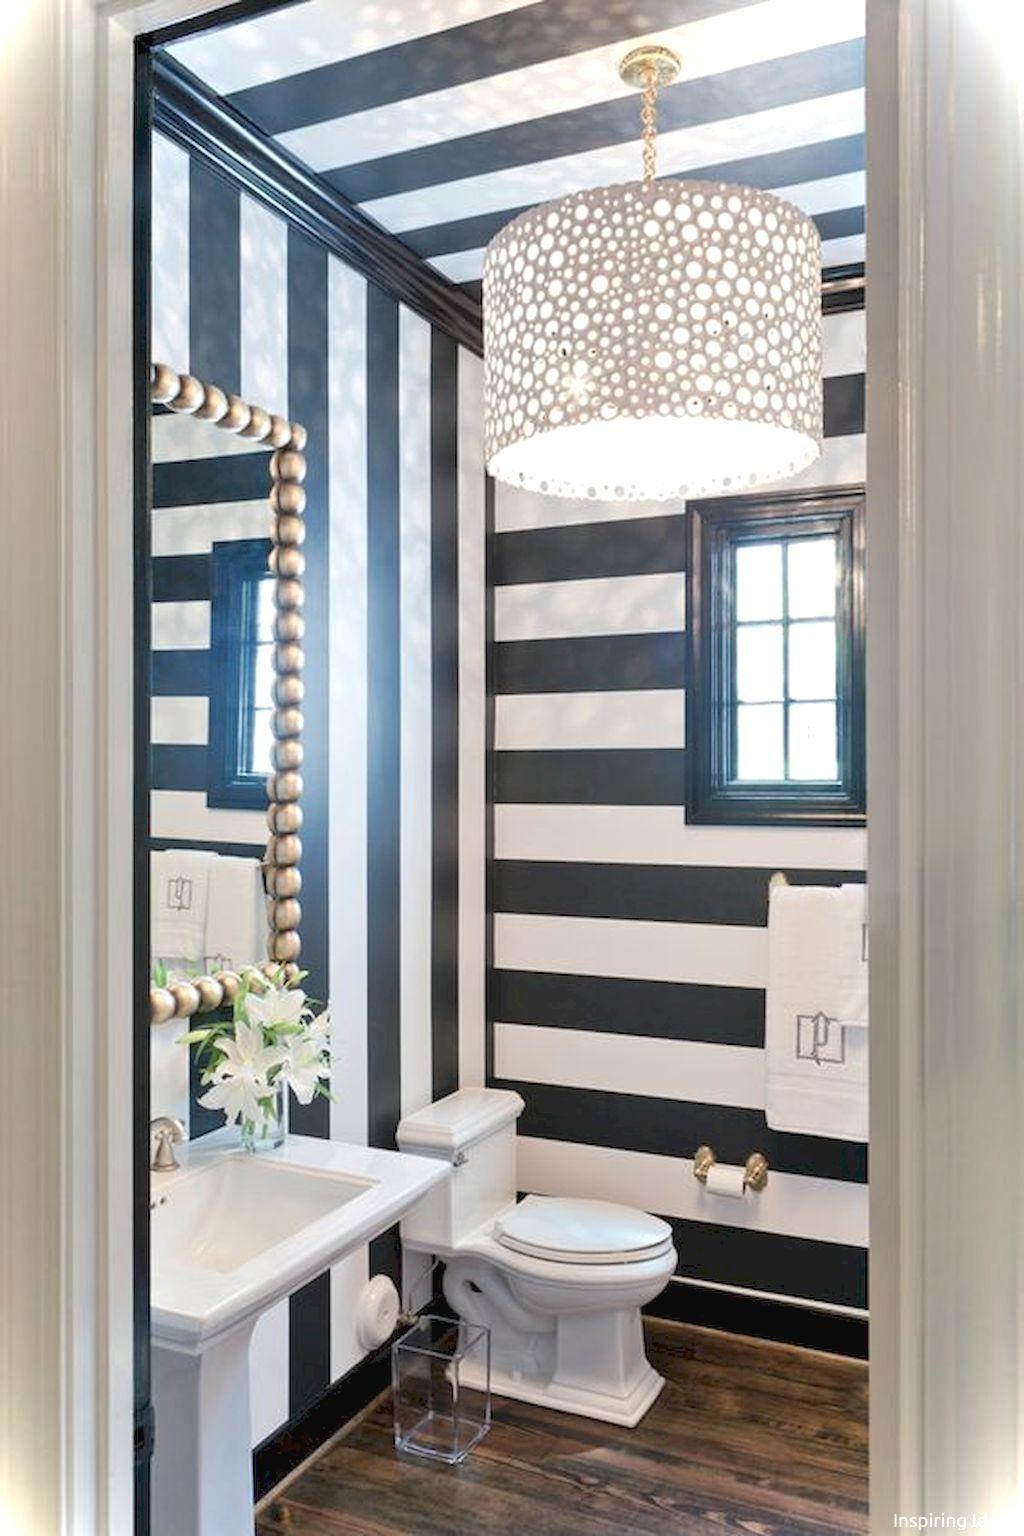 99+ Luxury Black and White Bathroom Ideas Striped